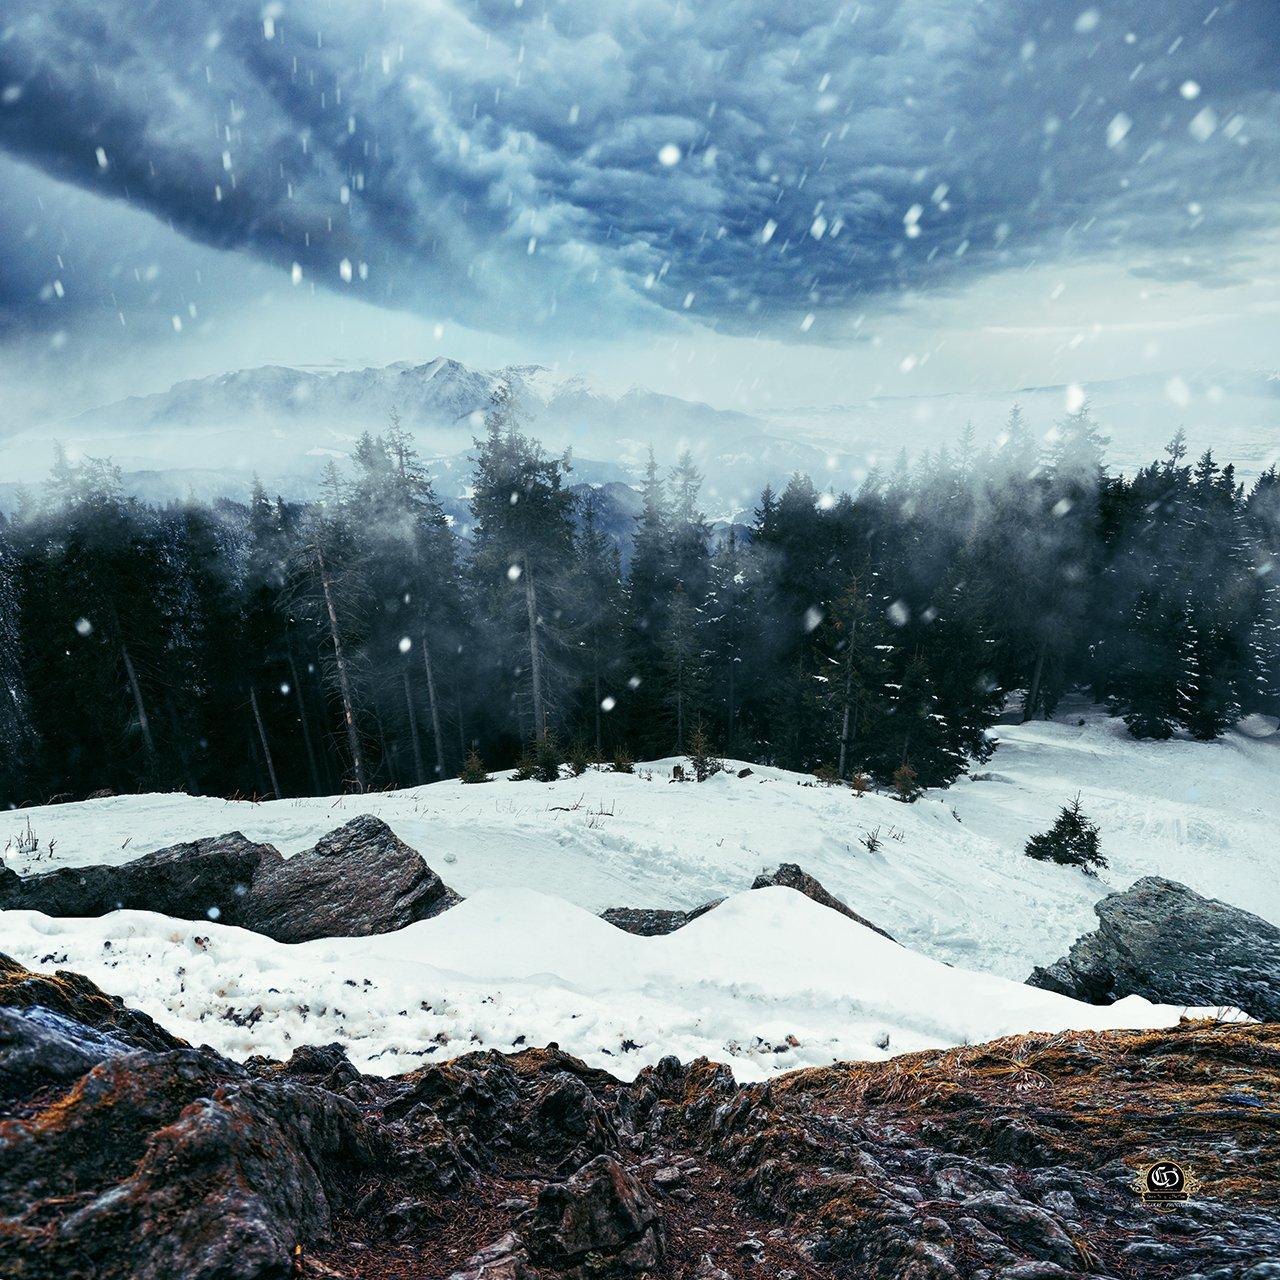 snow, winter, landcape, ps, manipulation, Caras Ionut